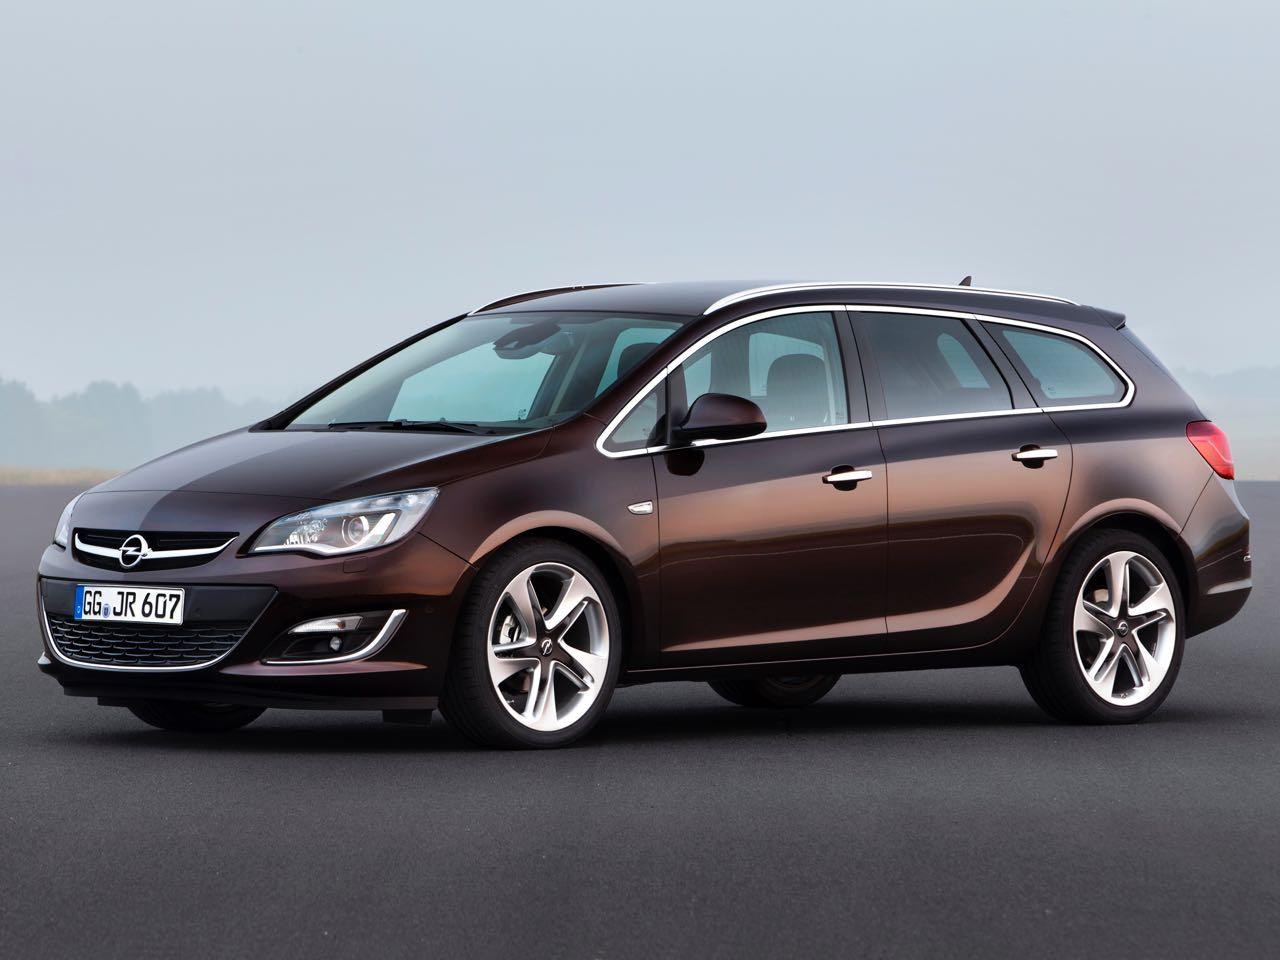 Opel Astra Sports Tourer 2012 – 1